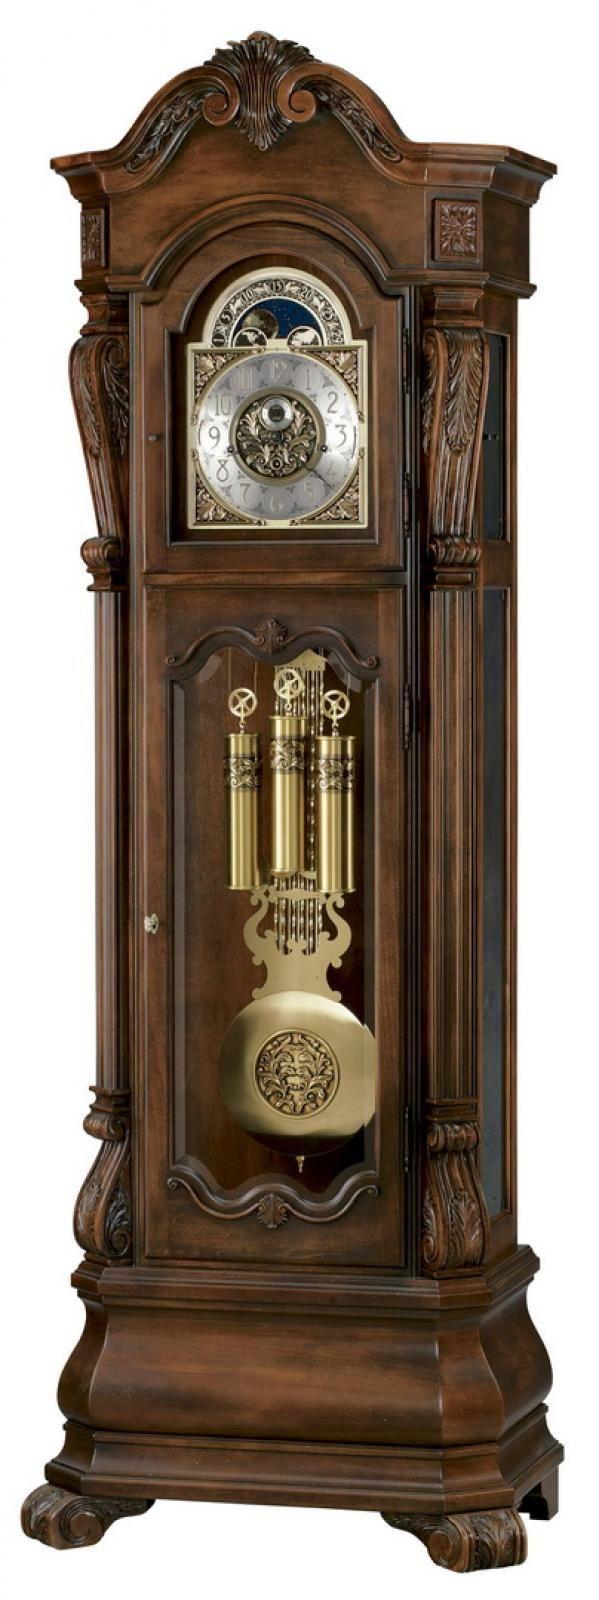 Best 25 diy mantel clocks ideas on pinterest mantel clocks clockway howard miller hamlin triple chiming fashion trend grandfather clock chm1048 amipublicfo Images